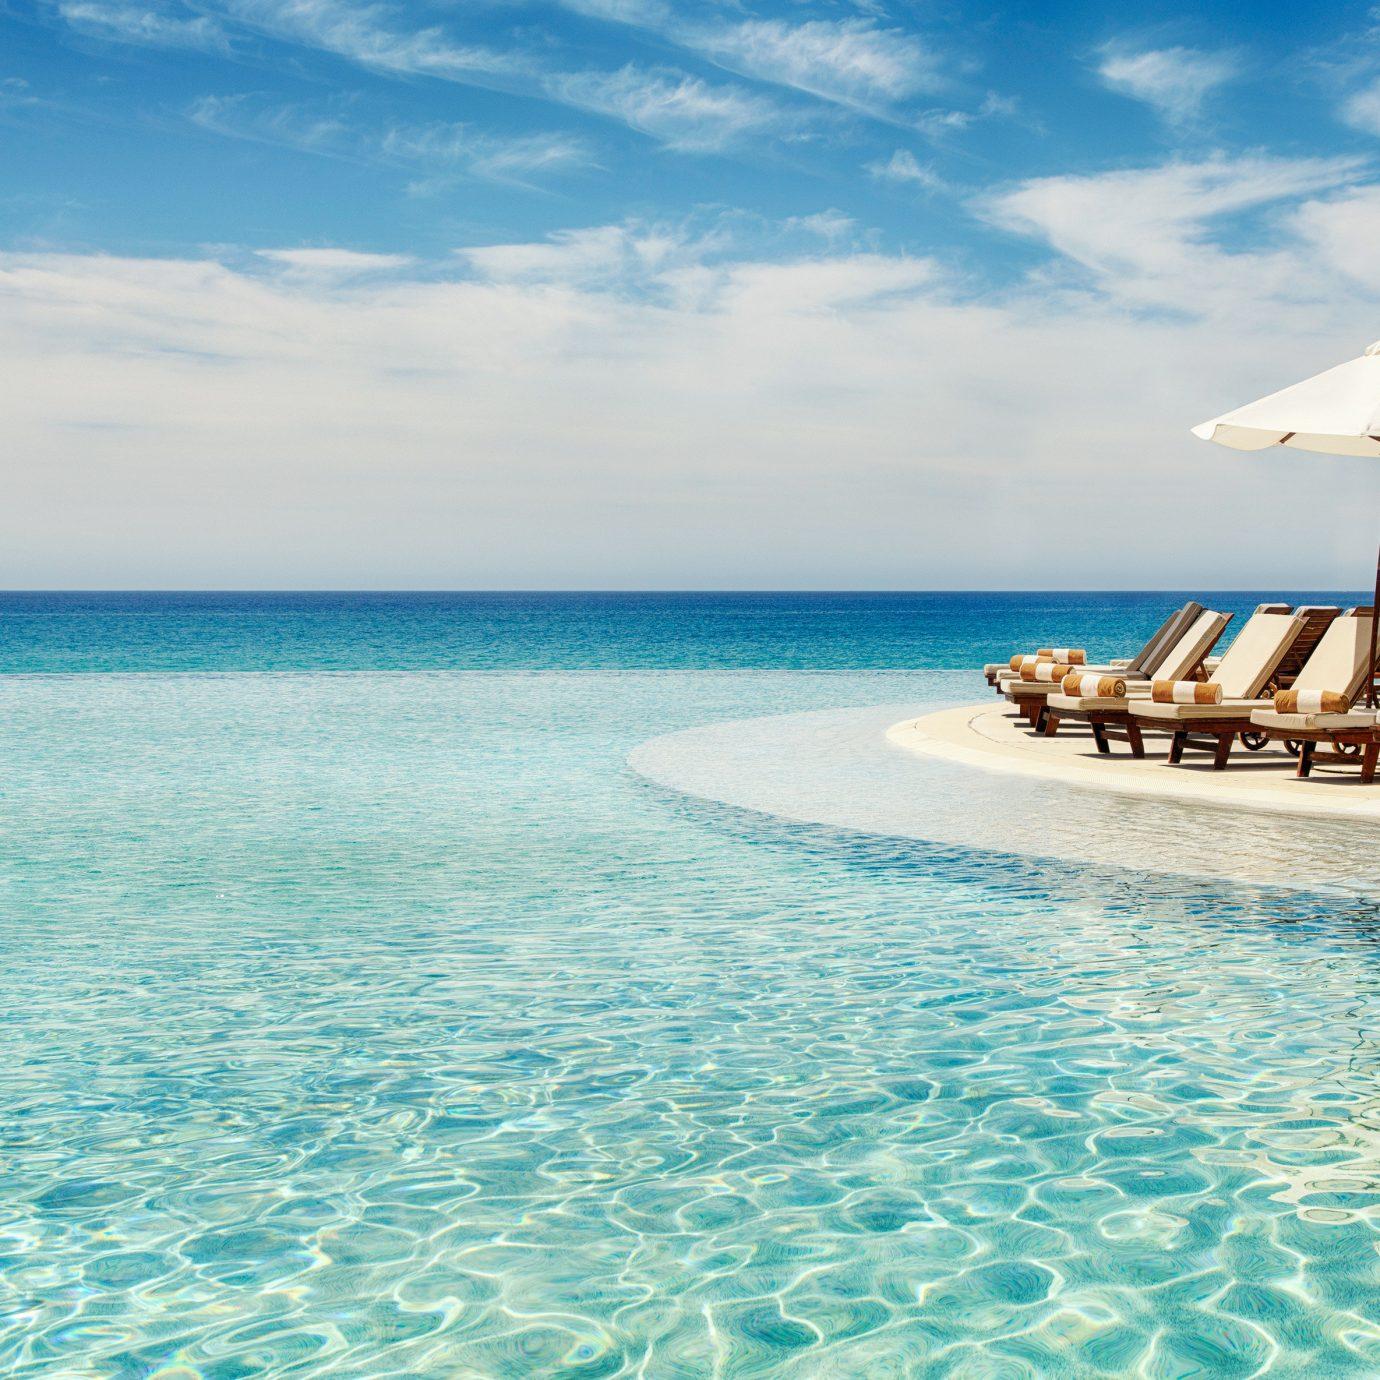 Beachfront Hotels Living Lounge Luxury Modern Pool Romance Tropical water sky outdoor umbrella chair Sea caribbean Ocean vacation horizon shore swimming pool Beach swimming blue Nature Lagoon Resort Island Coast atoll bay islet cay cape day